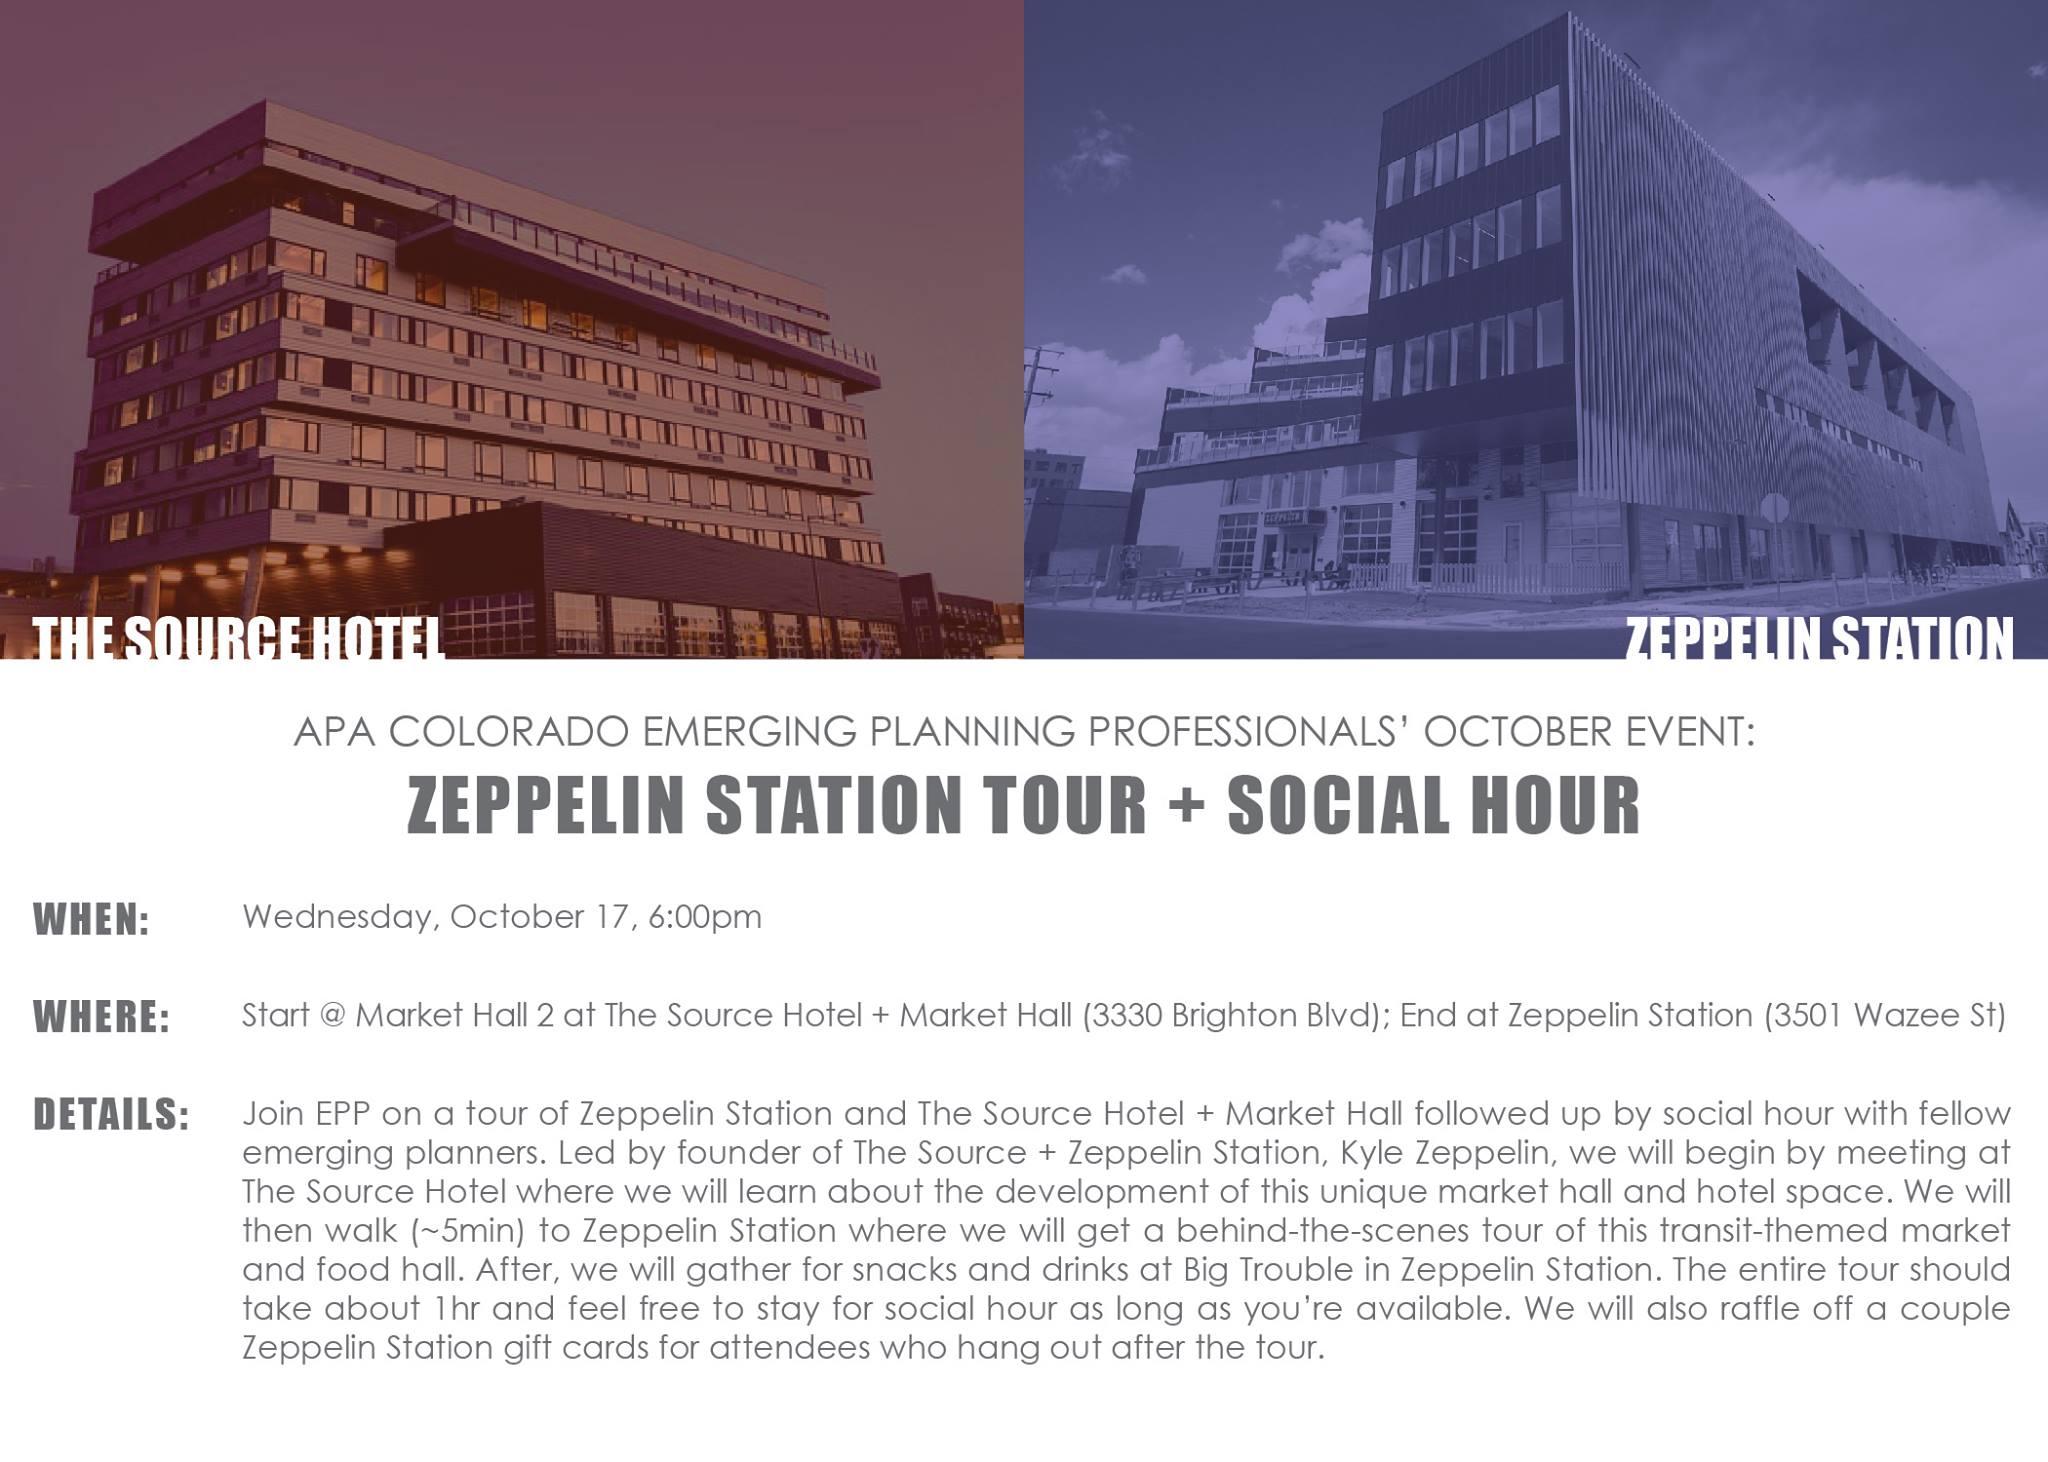 Flyer for the APA/EPP Zeppelin Station Tour Event